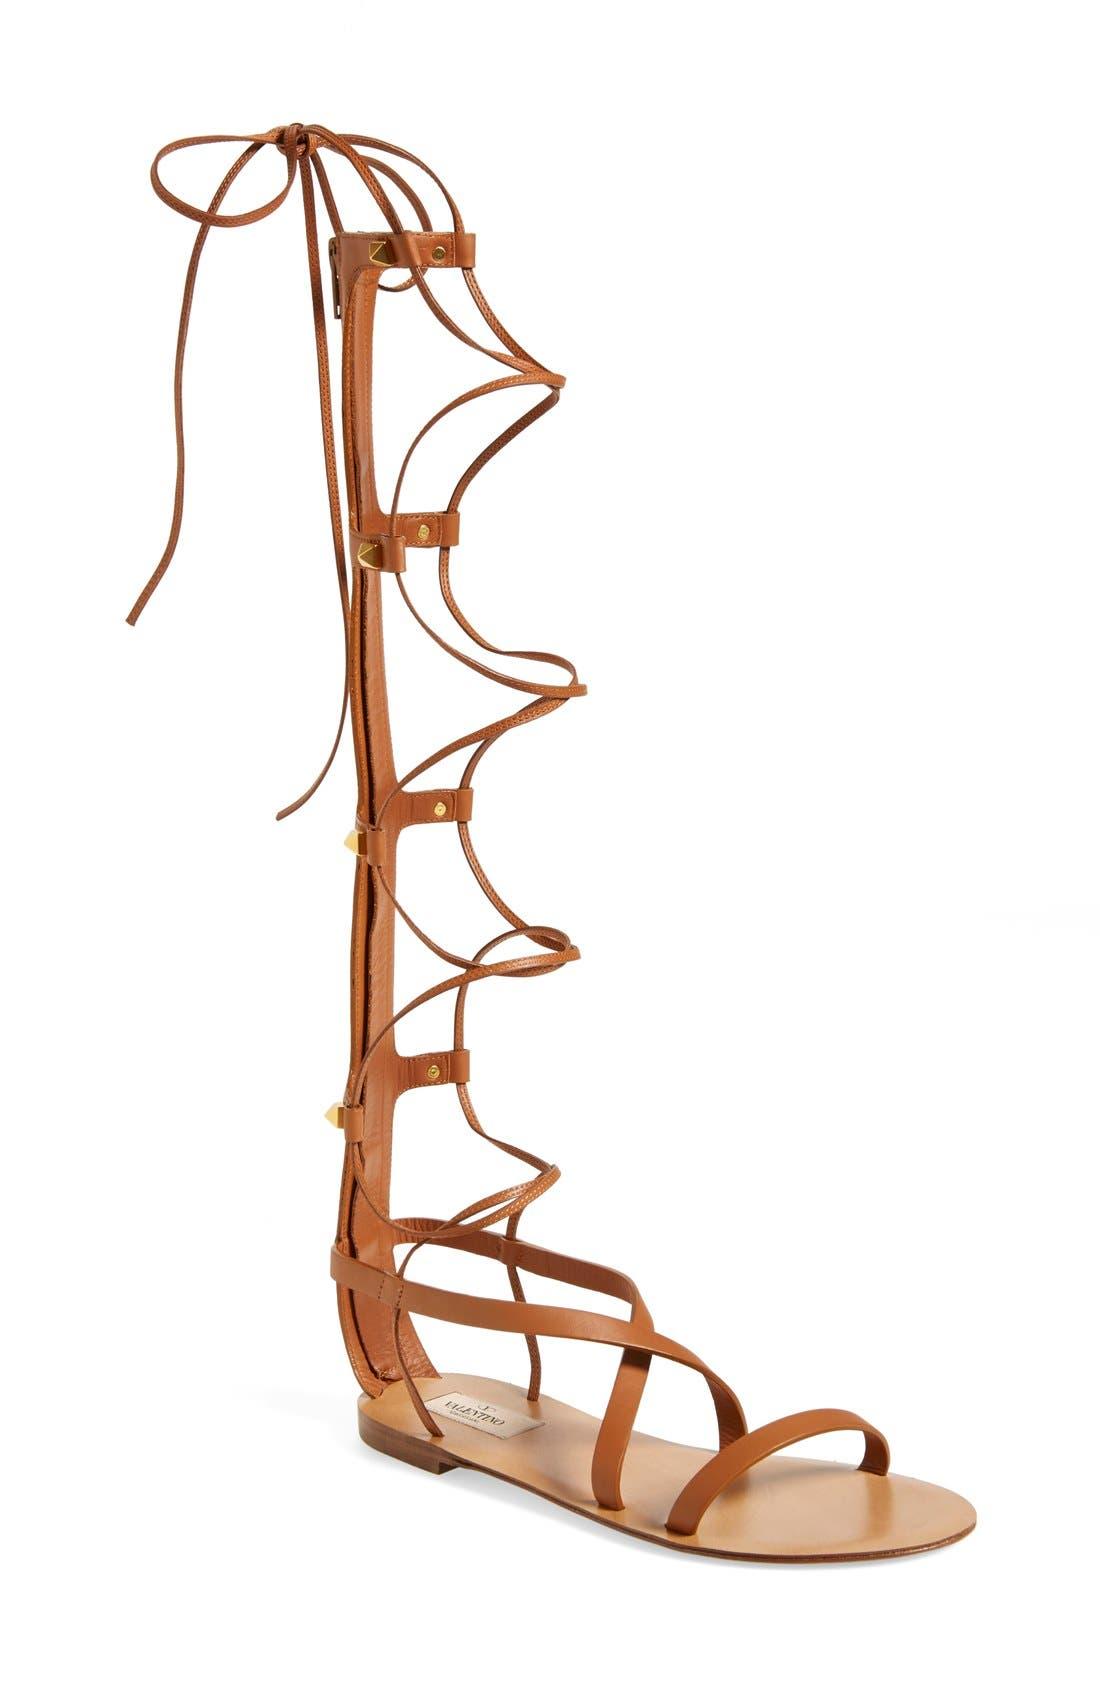 Alternate Image 1 Selected - Valentino 'Rockstud' Tall Gladiator Sandal (Women)